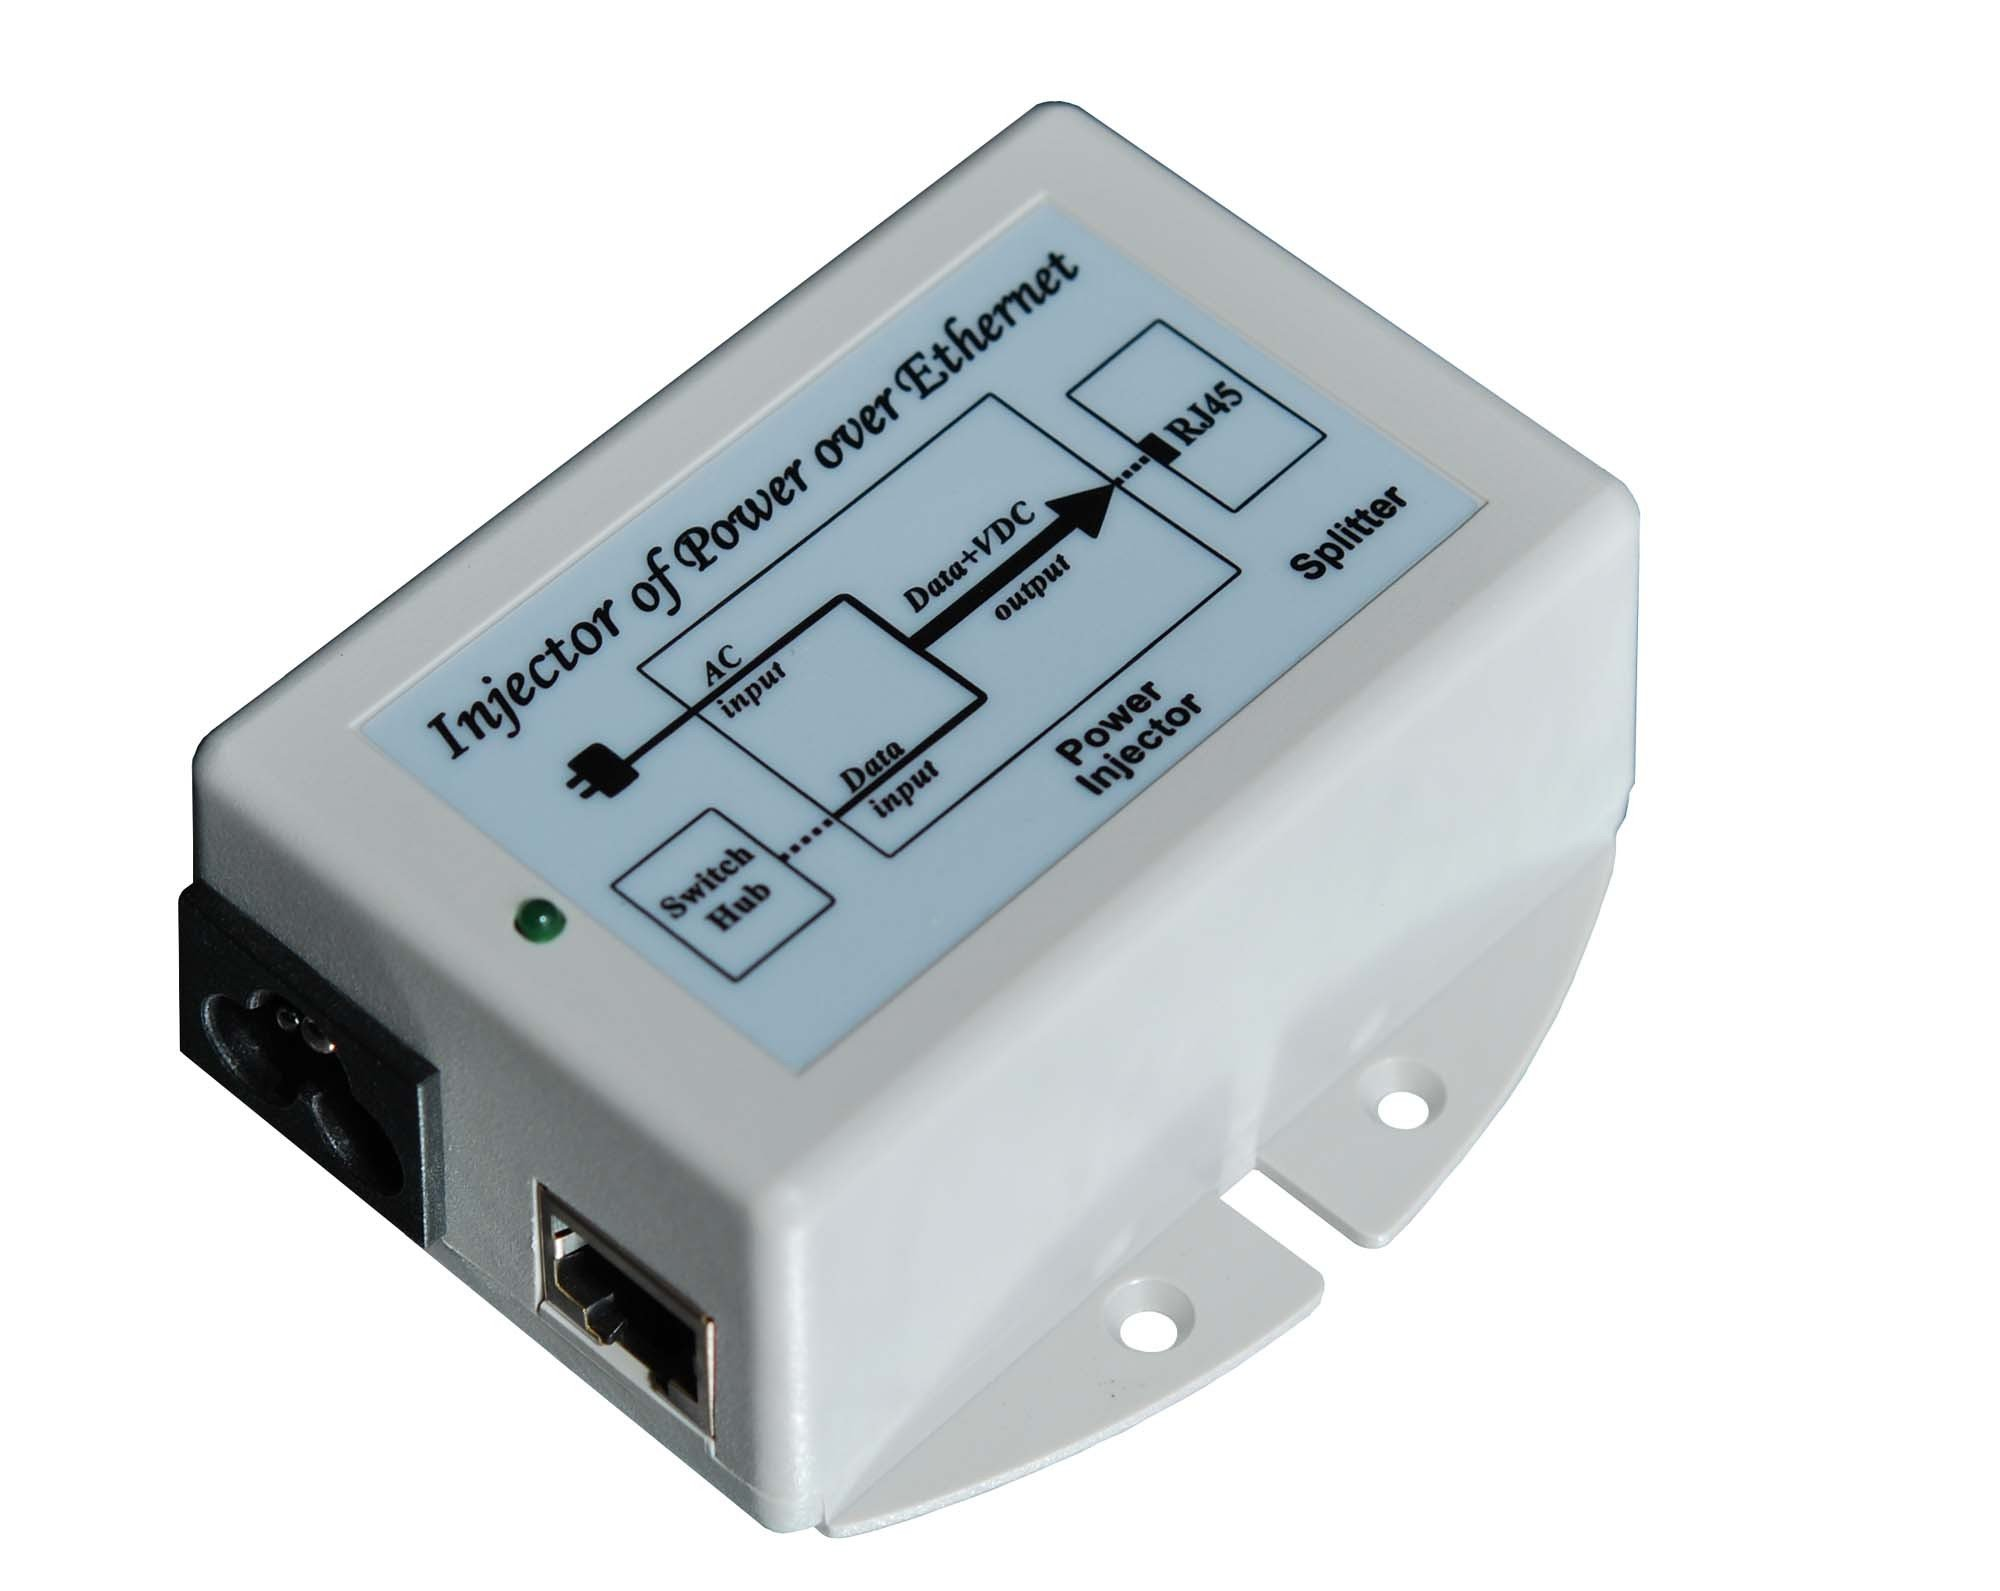 TYCON SYSTEMS TP-POE-48G 48V 24W Gigabit Passive POE Inserter Computer Surge Protector